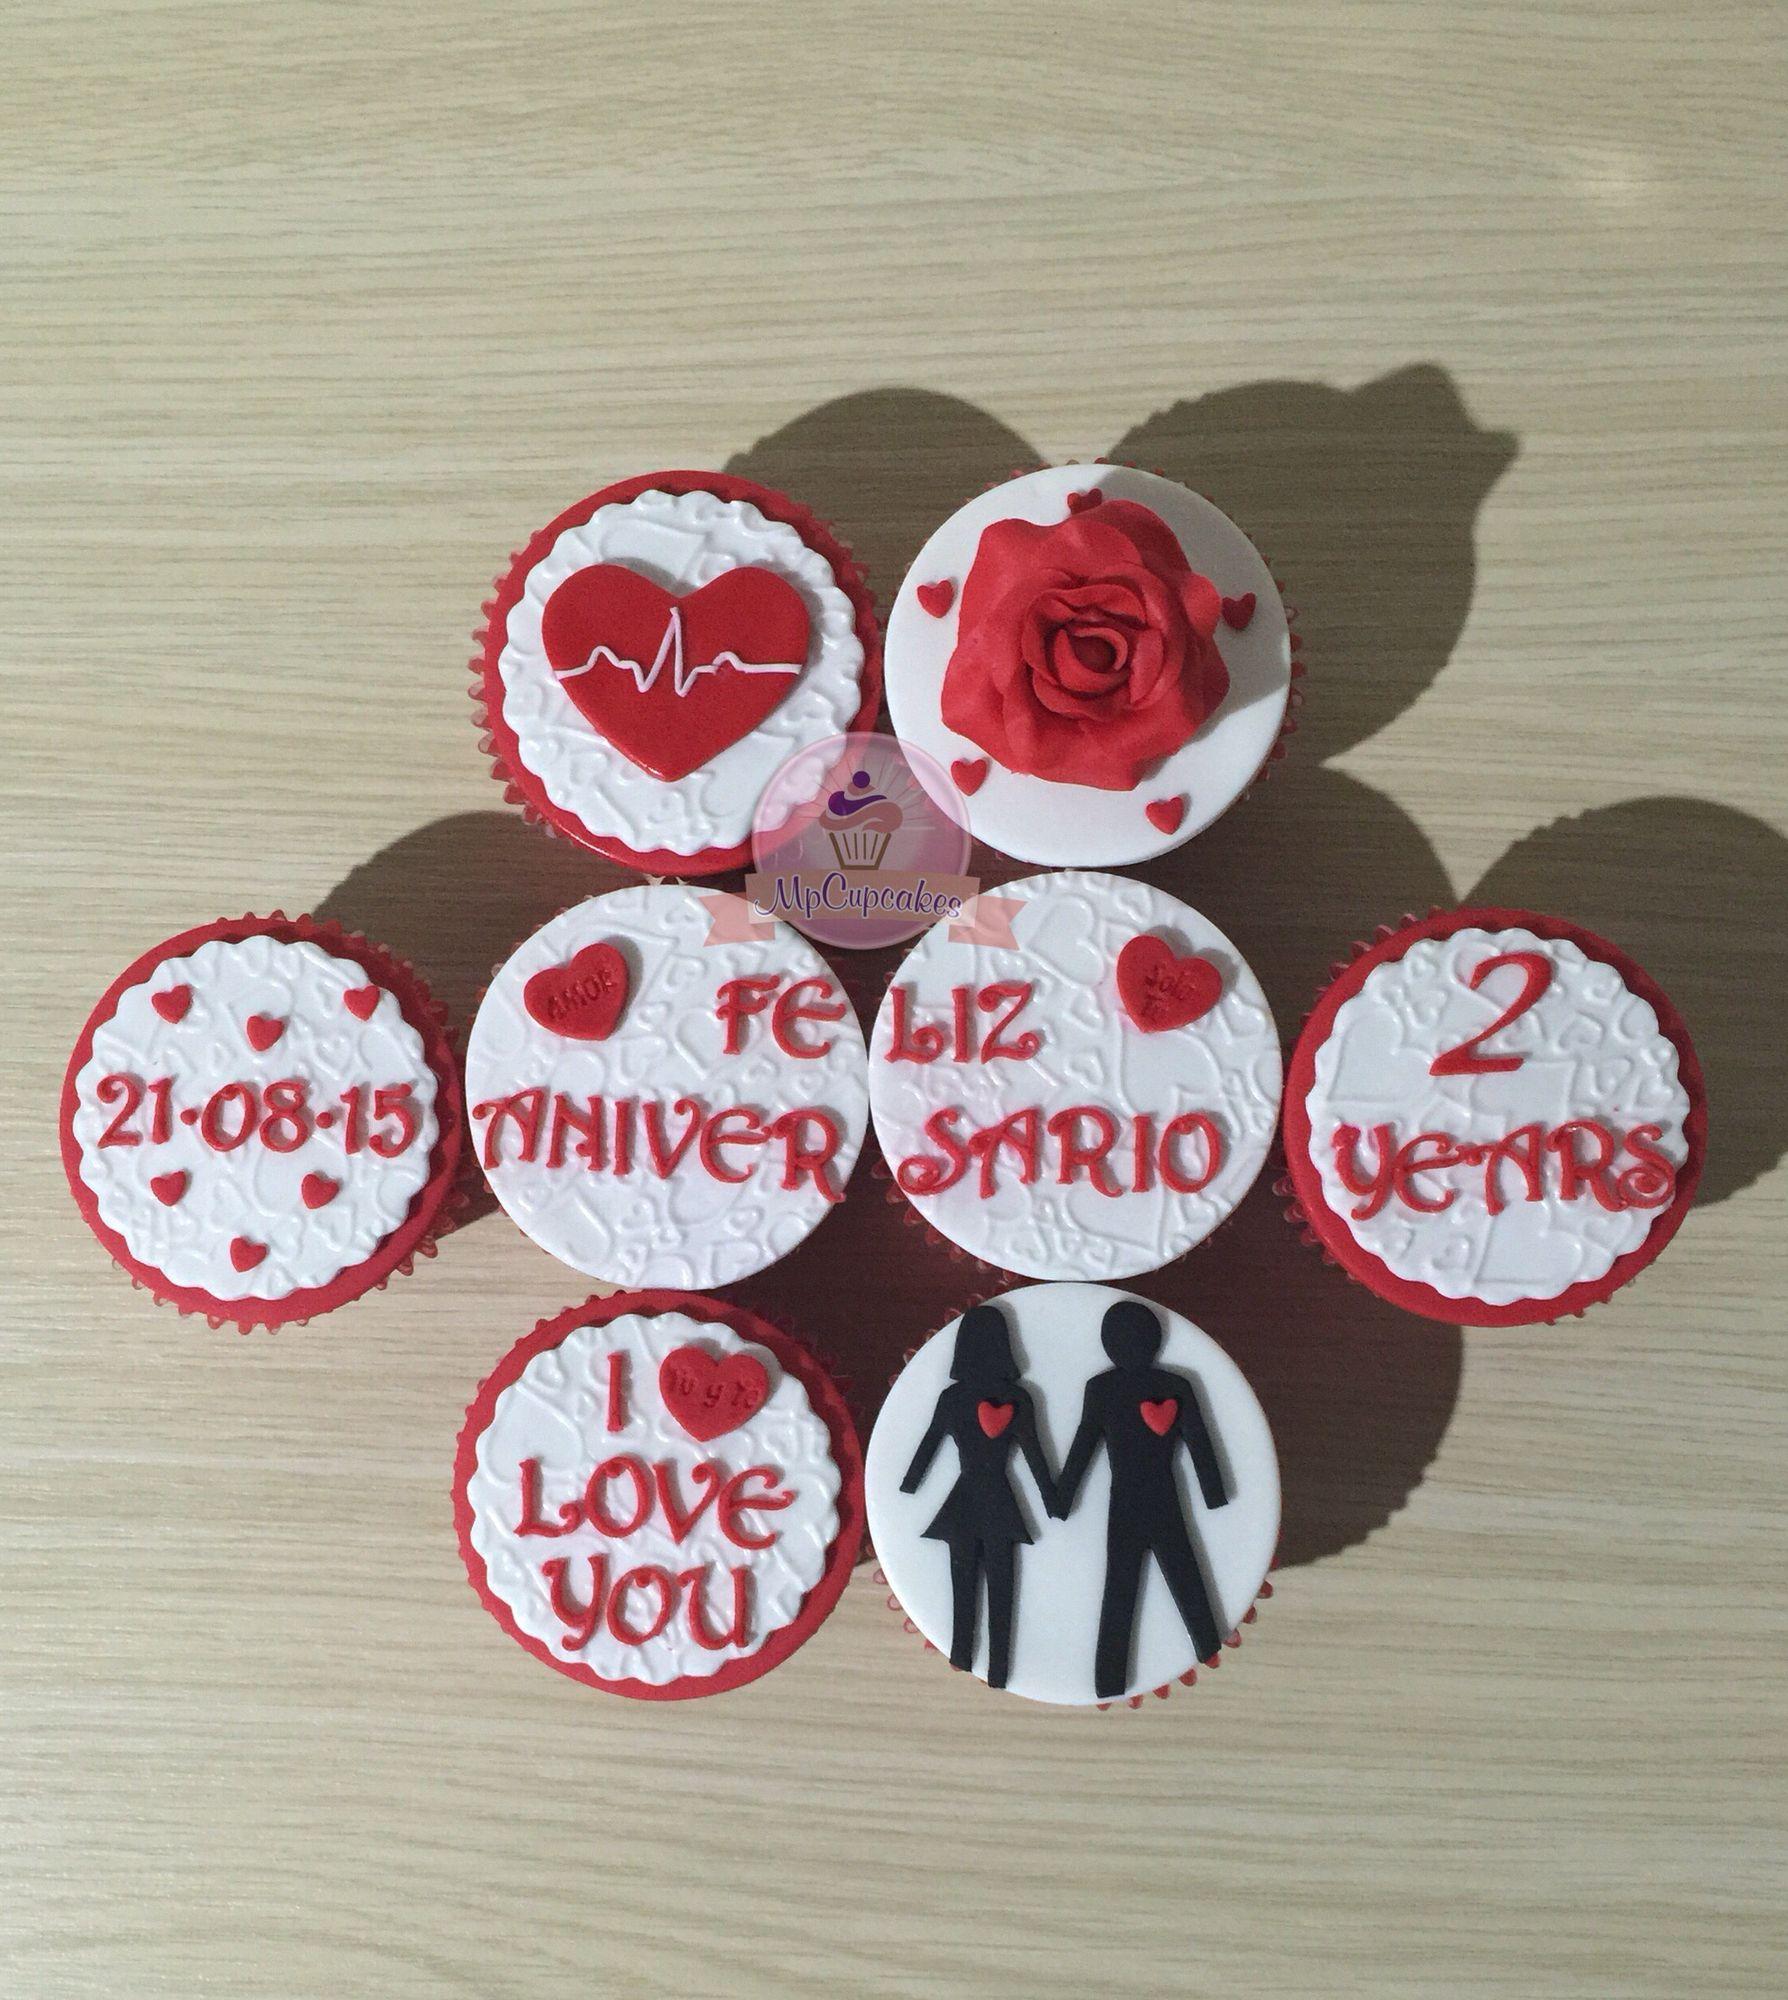 Cupcakes De Aniversario Cupcakes De Amor Cupcakes Con Mensaje